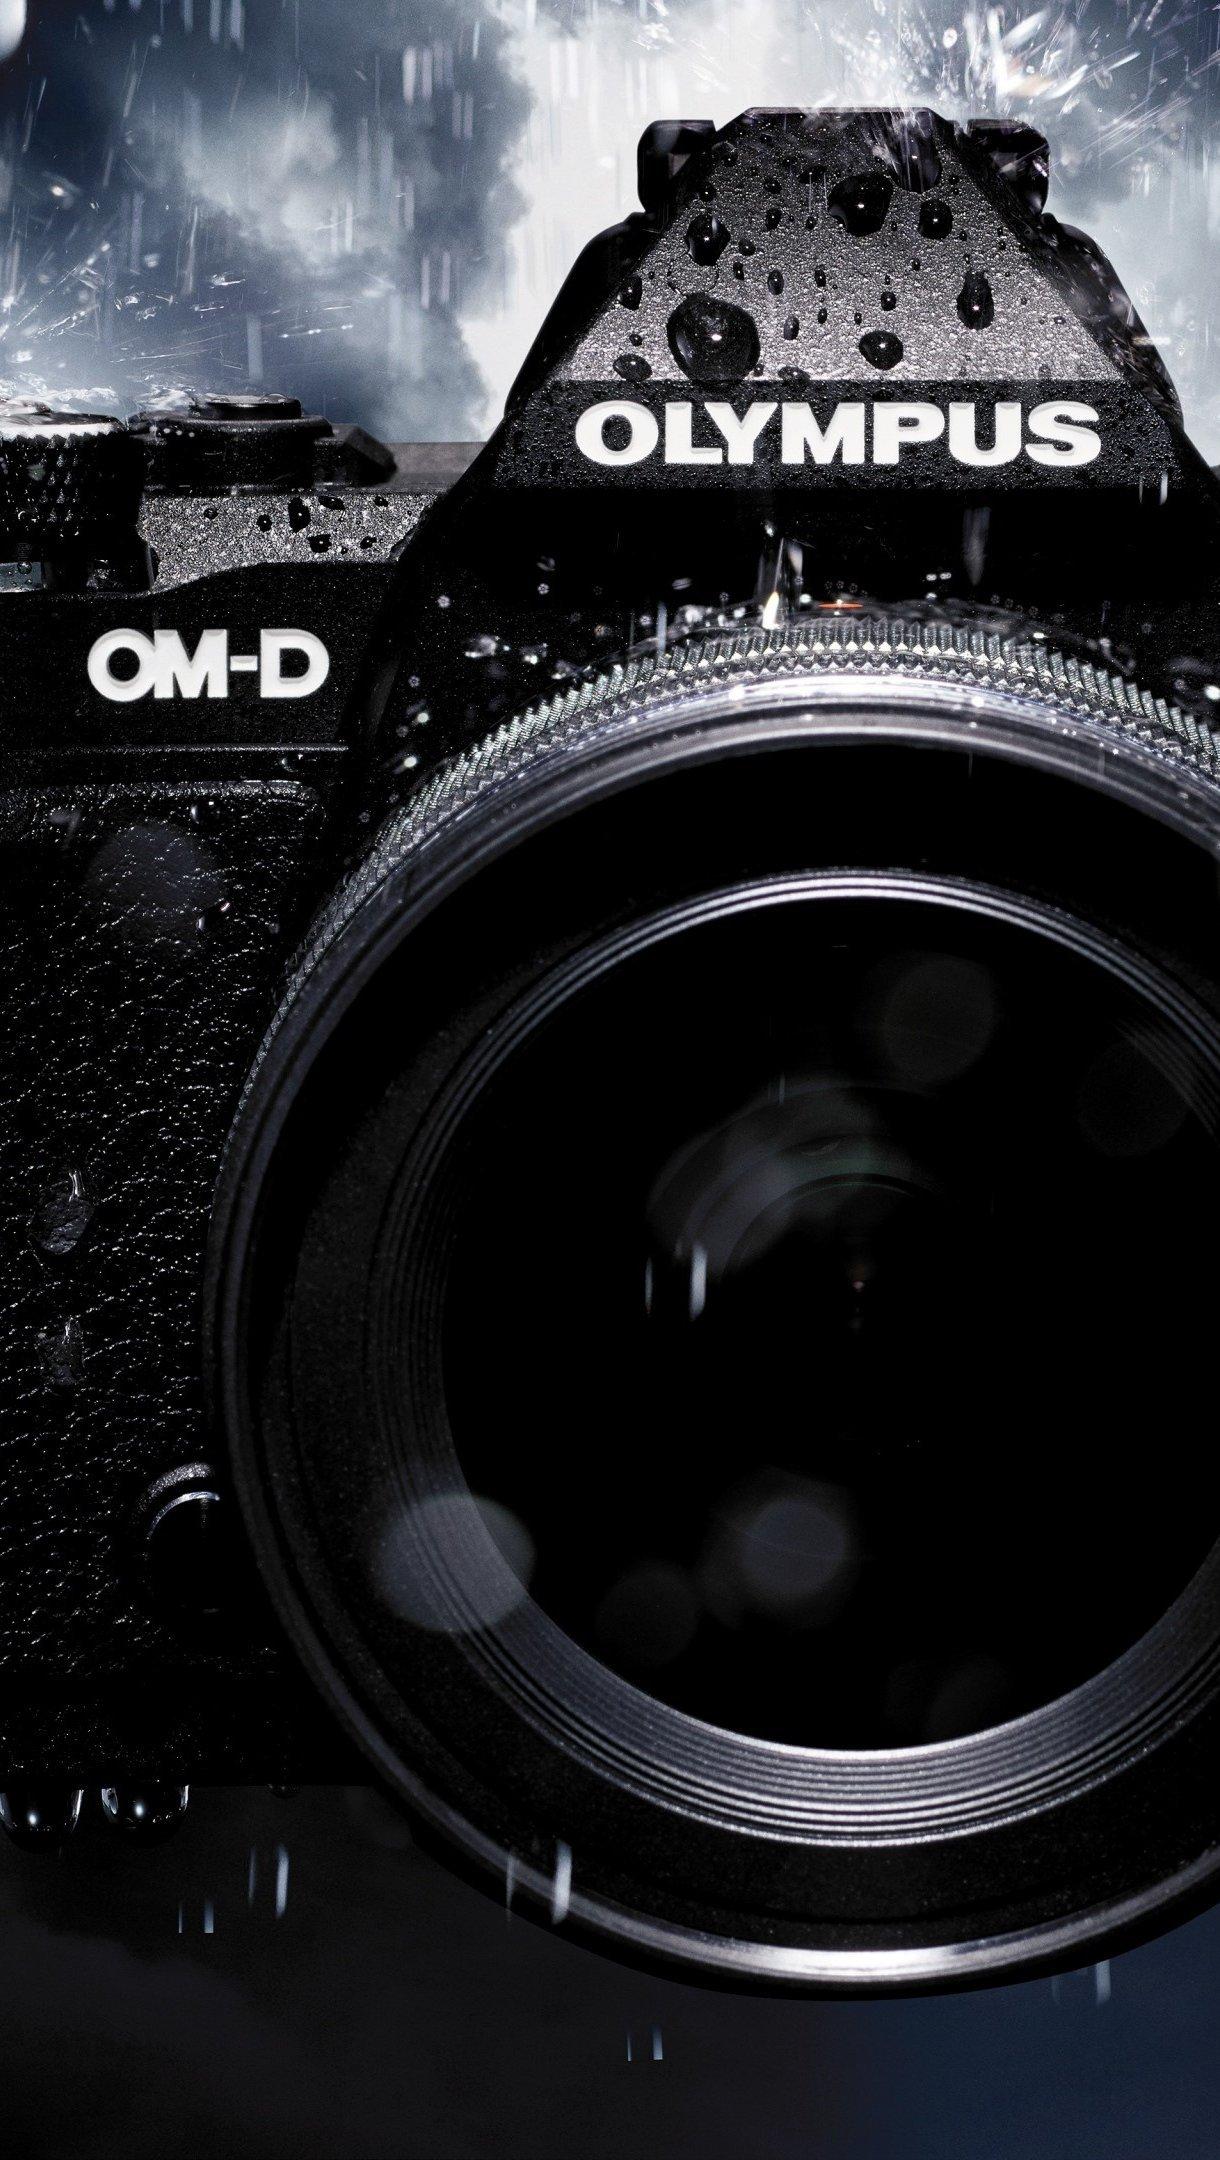 Wallpaper Olympus OM-D camera Vertical